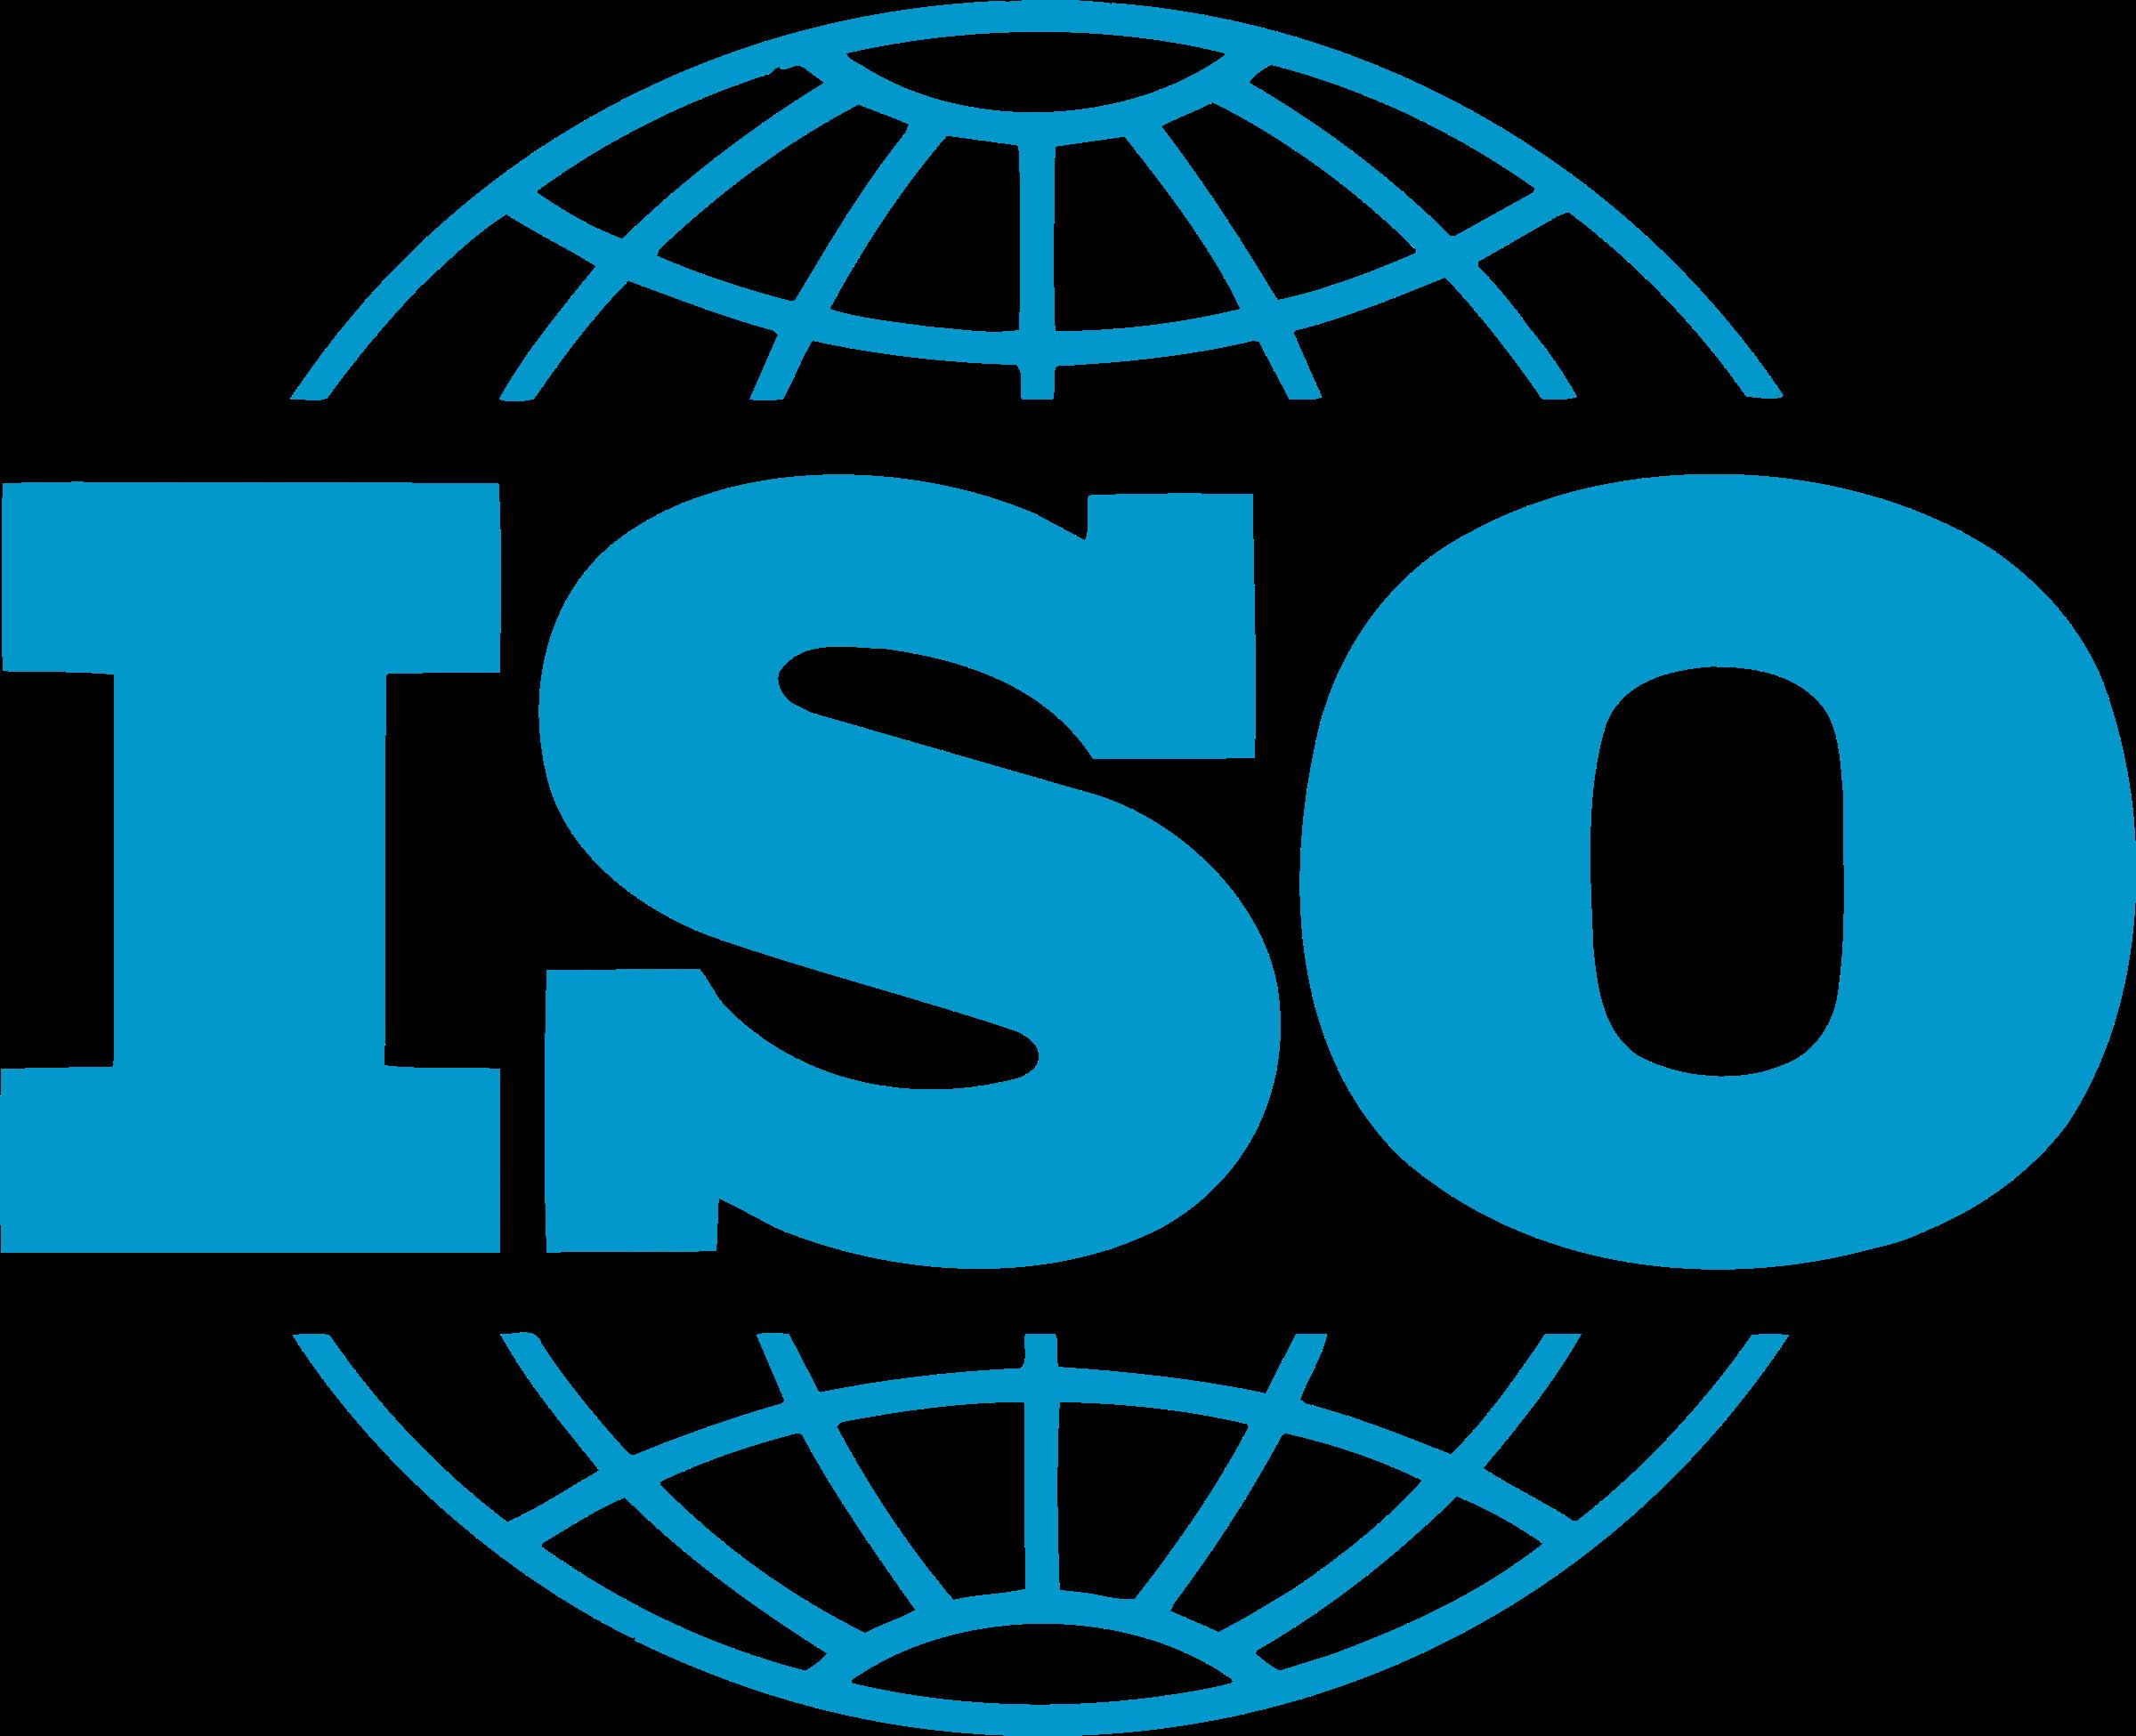 ISO Logo PNG Transparent & SVG Vector.